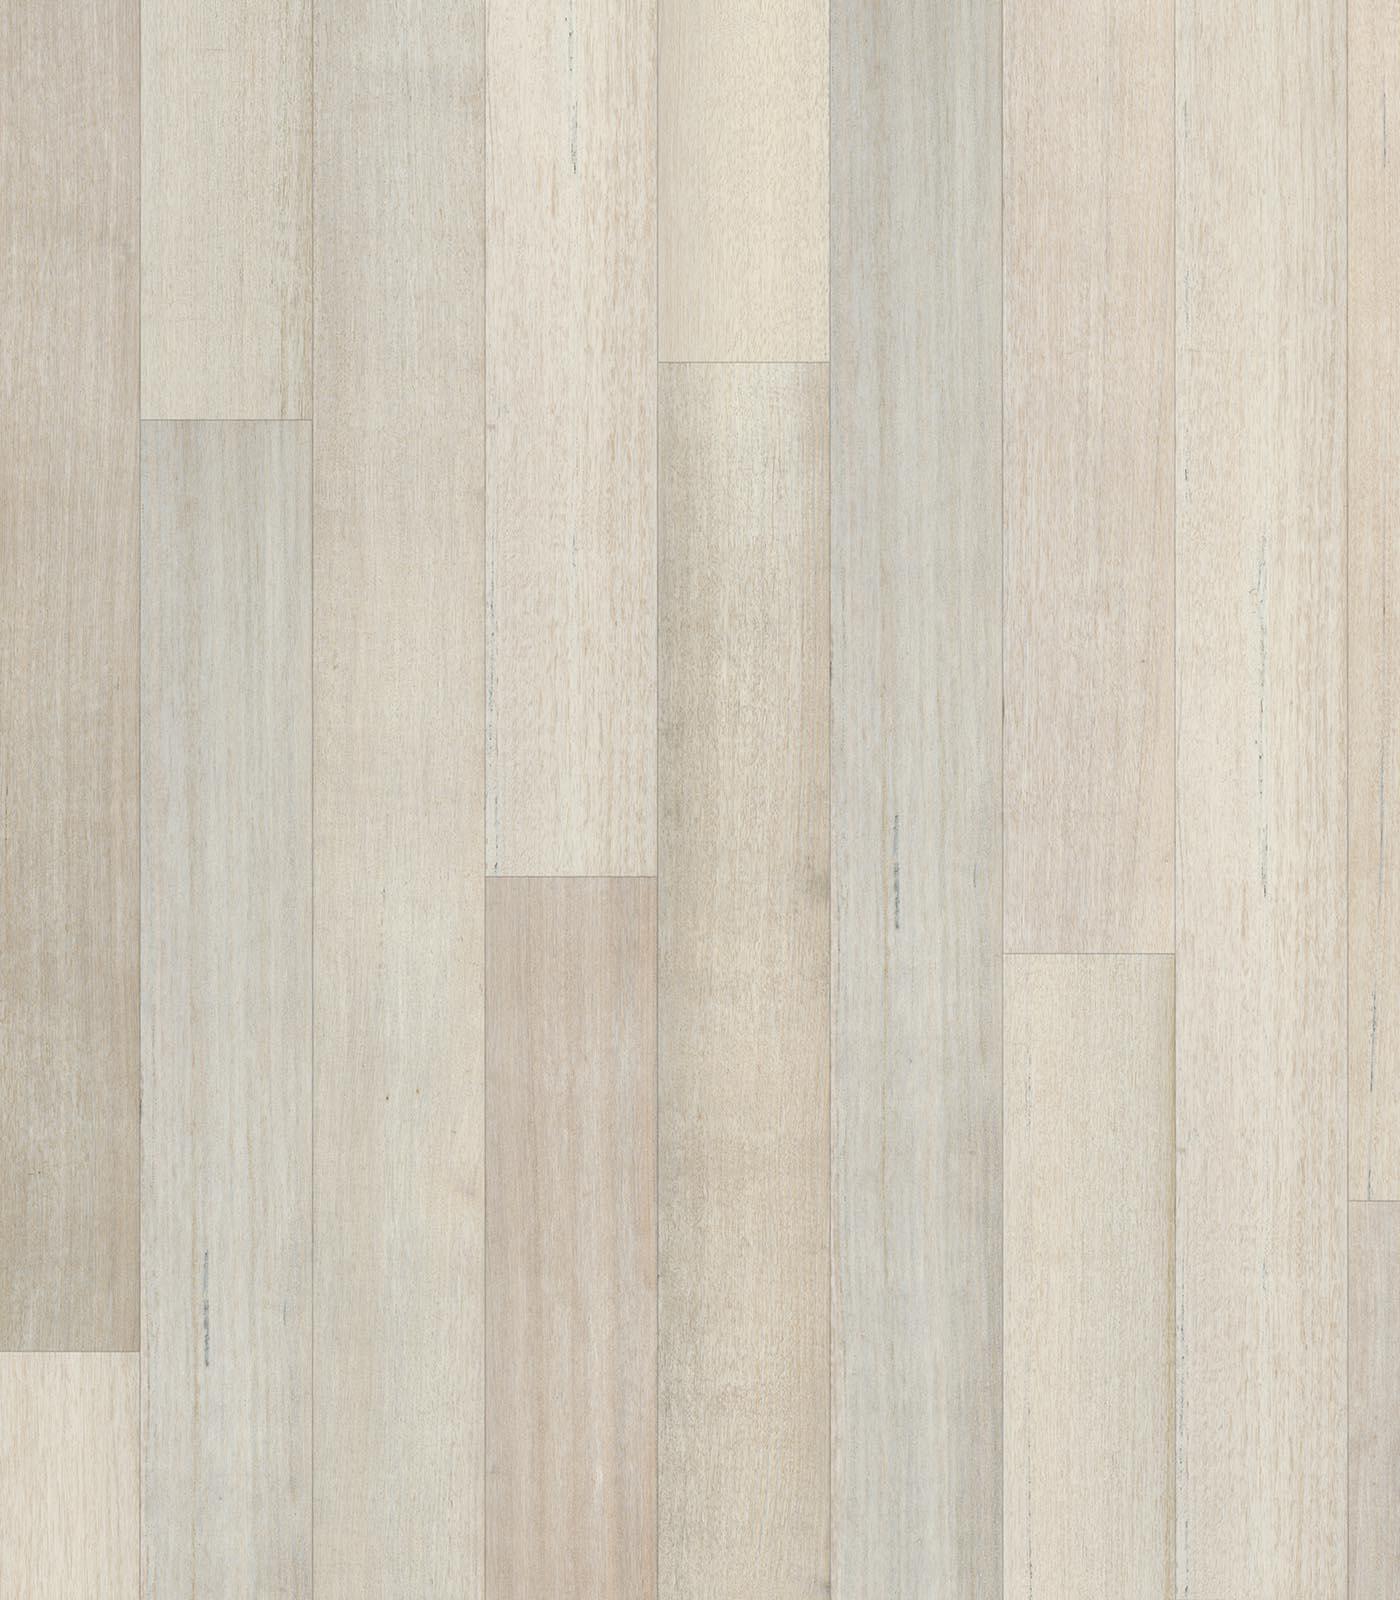 Geraldton-After Oak Collection-Tasmanian Oak Floors-flat